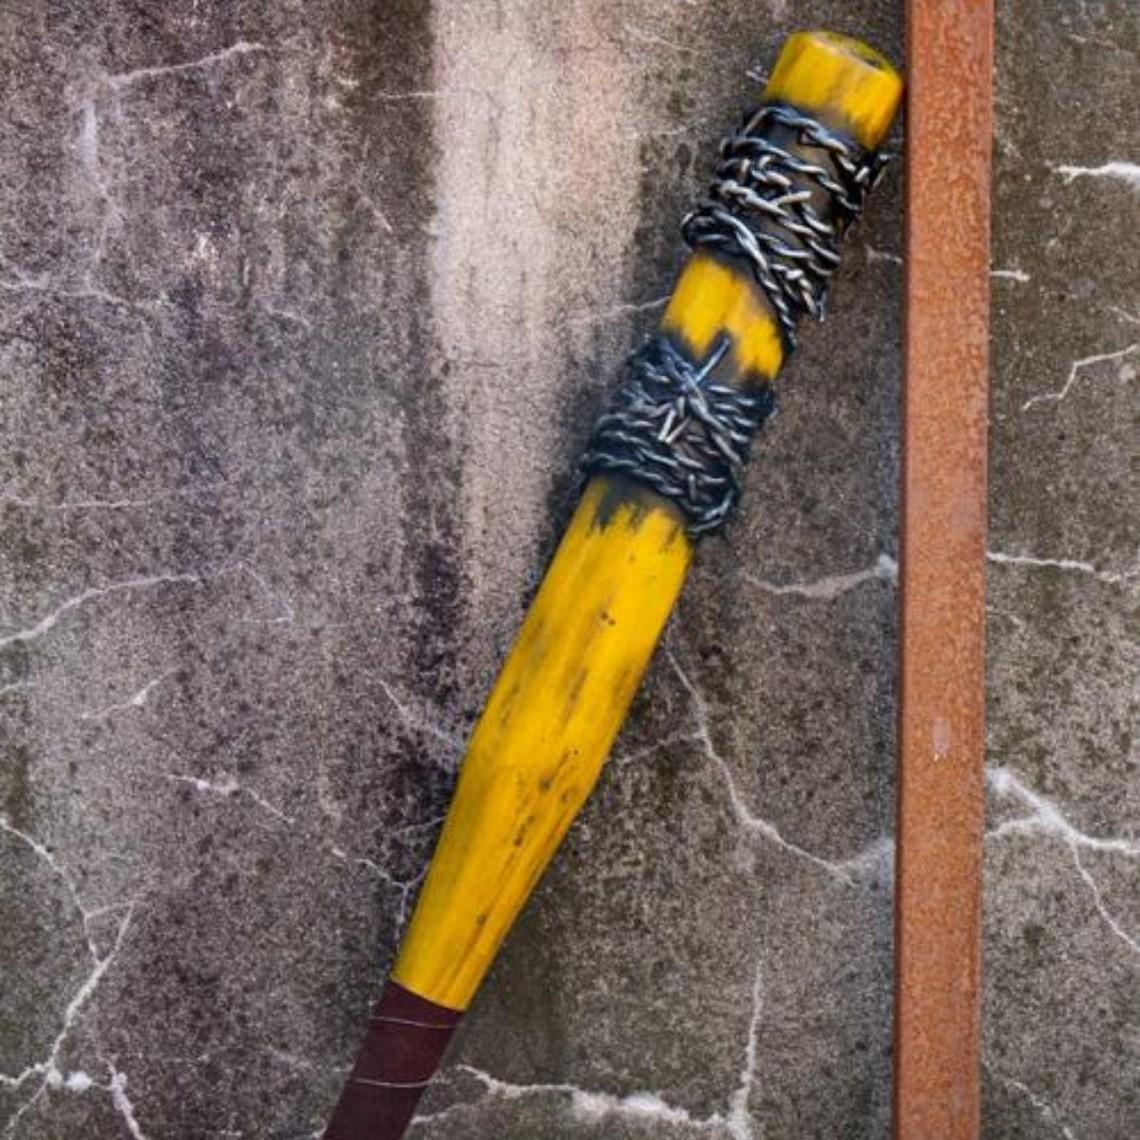 Epic Armoury LARP alambre de púas bate de béisbol, 80 cm, amarillo